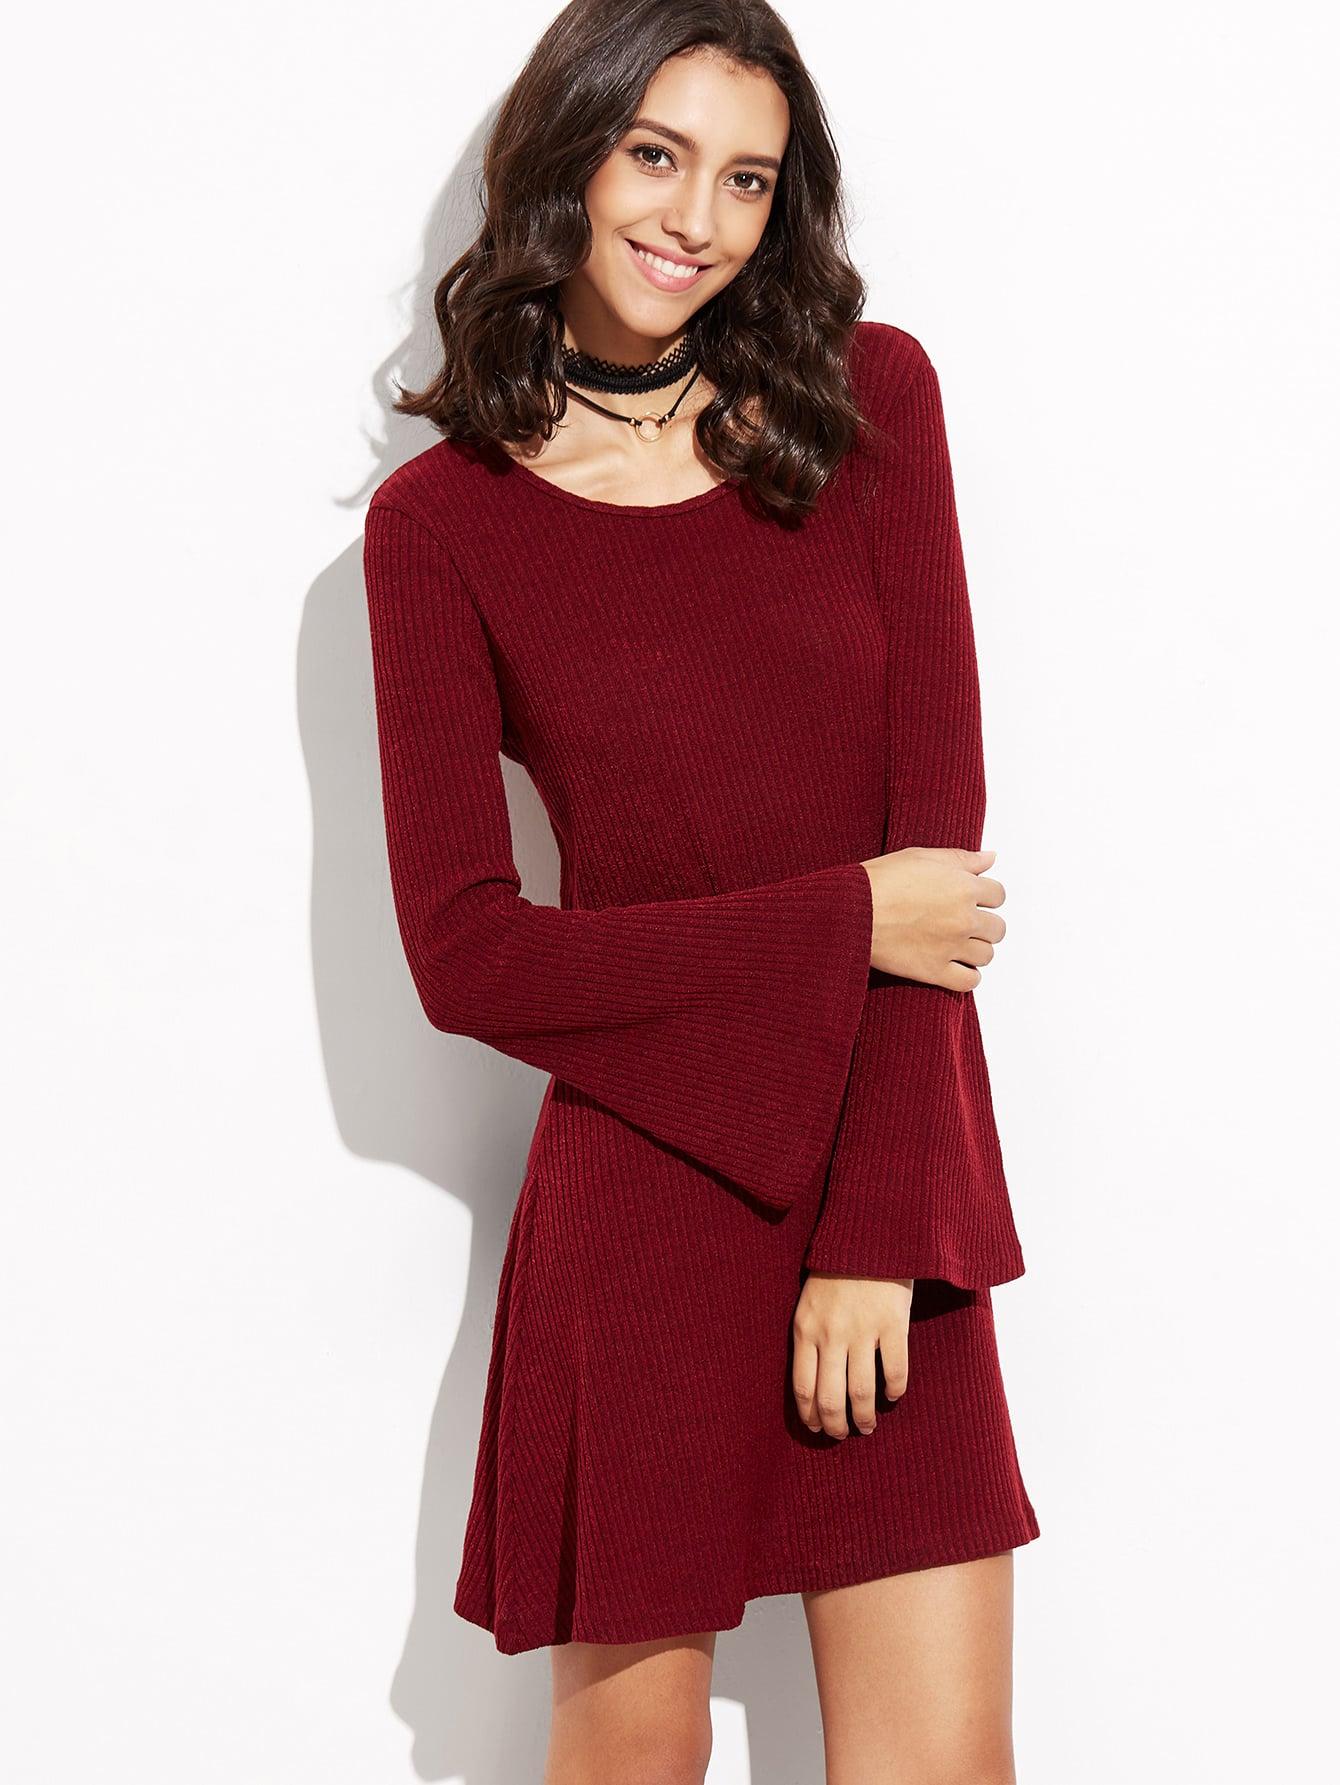 Fluted Sleeve Ribbed Dress dress160826402